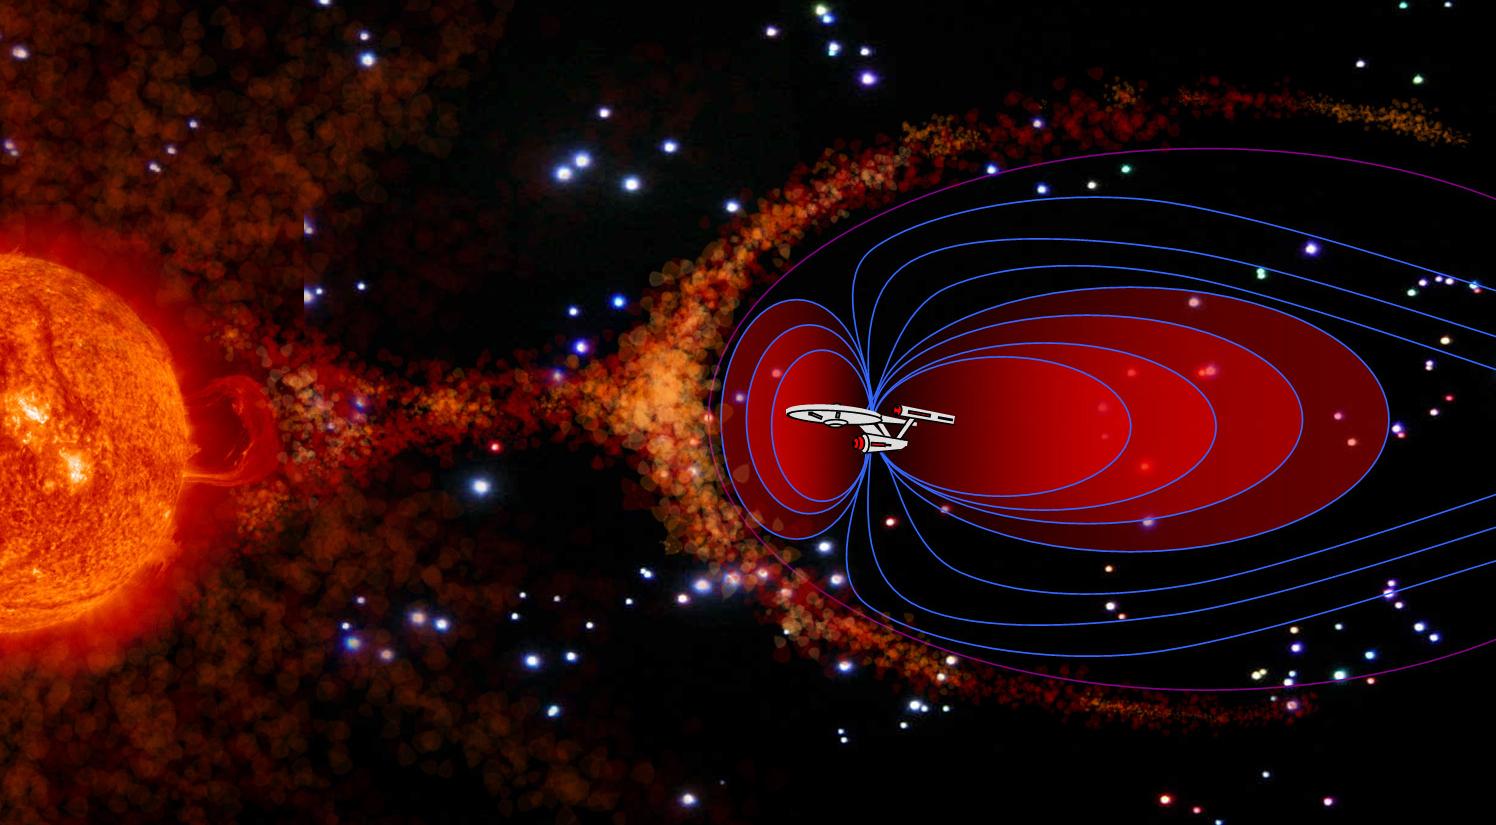 Scientists Produce Star Trek Like Deflector Device For